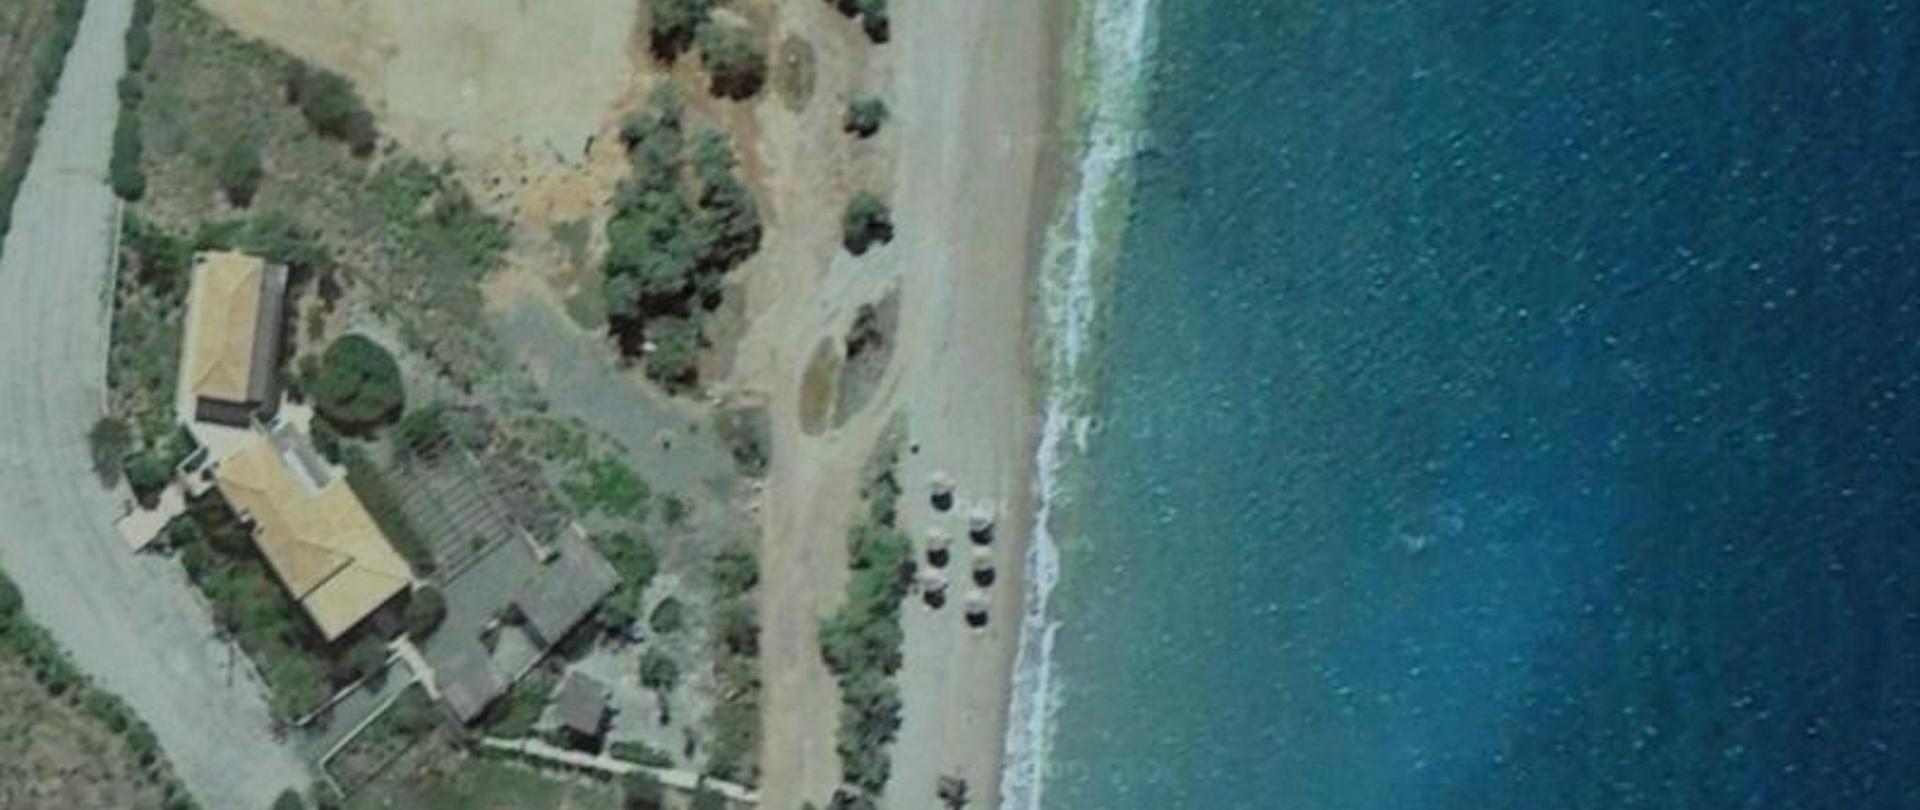 Satelite image of Malindi Rooms